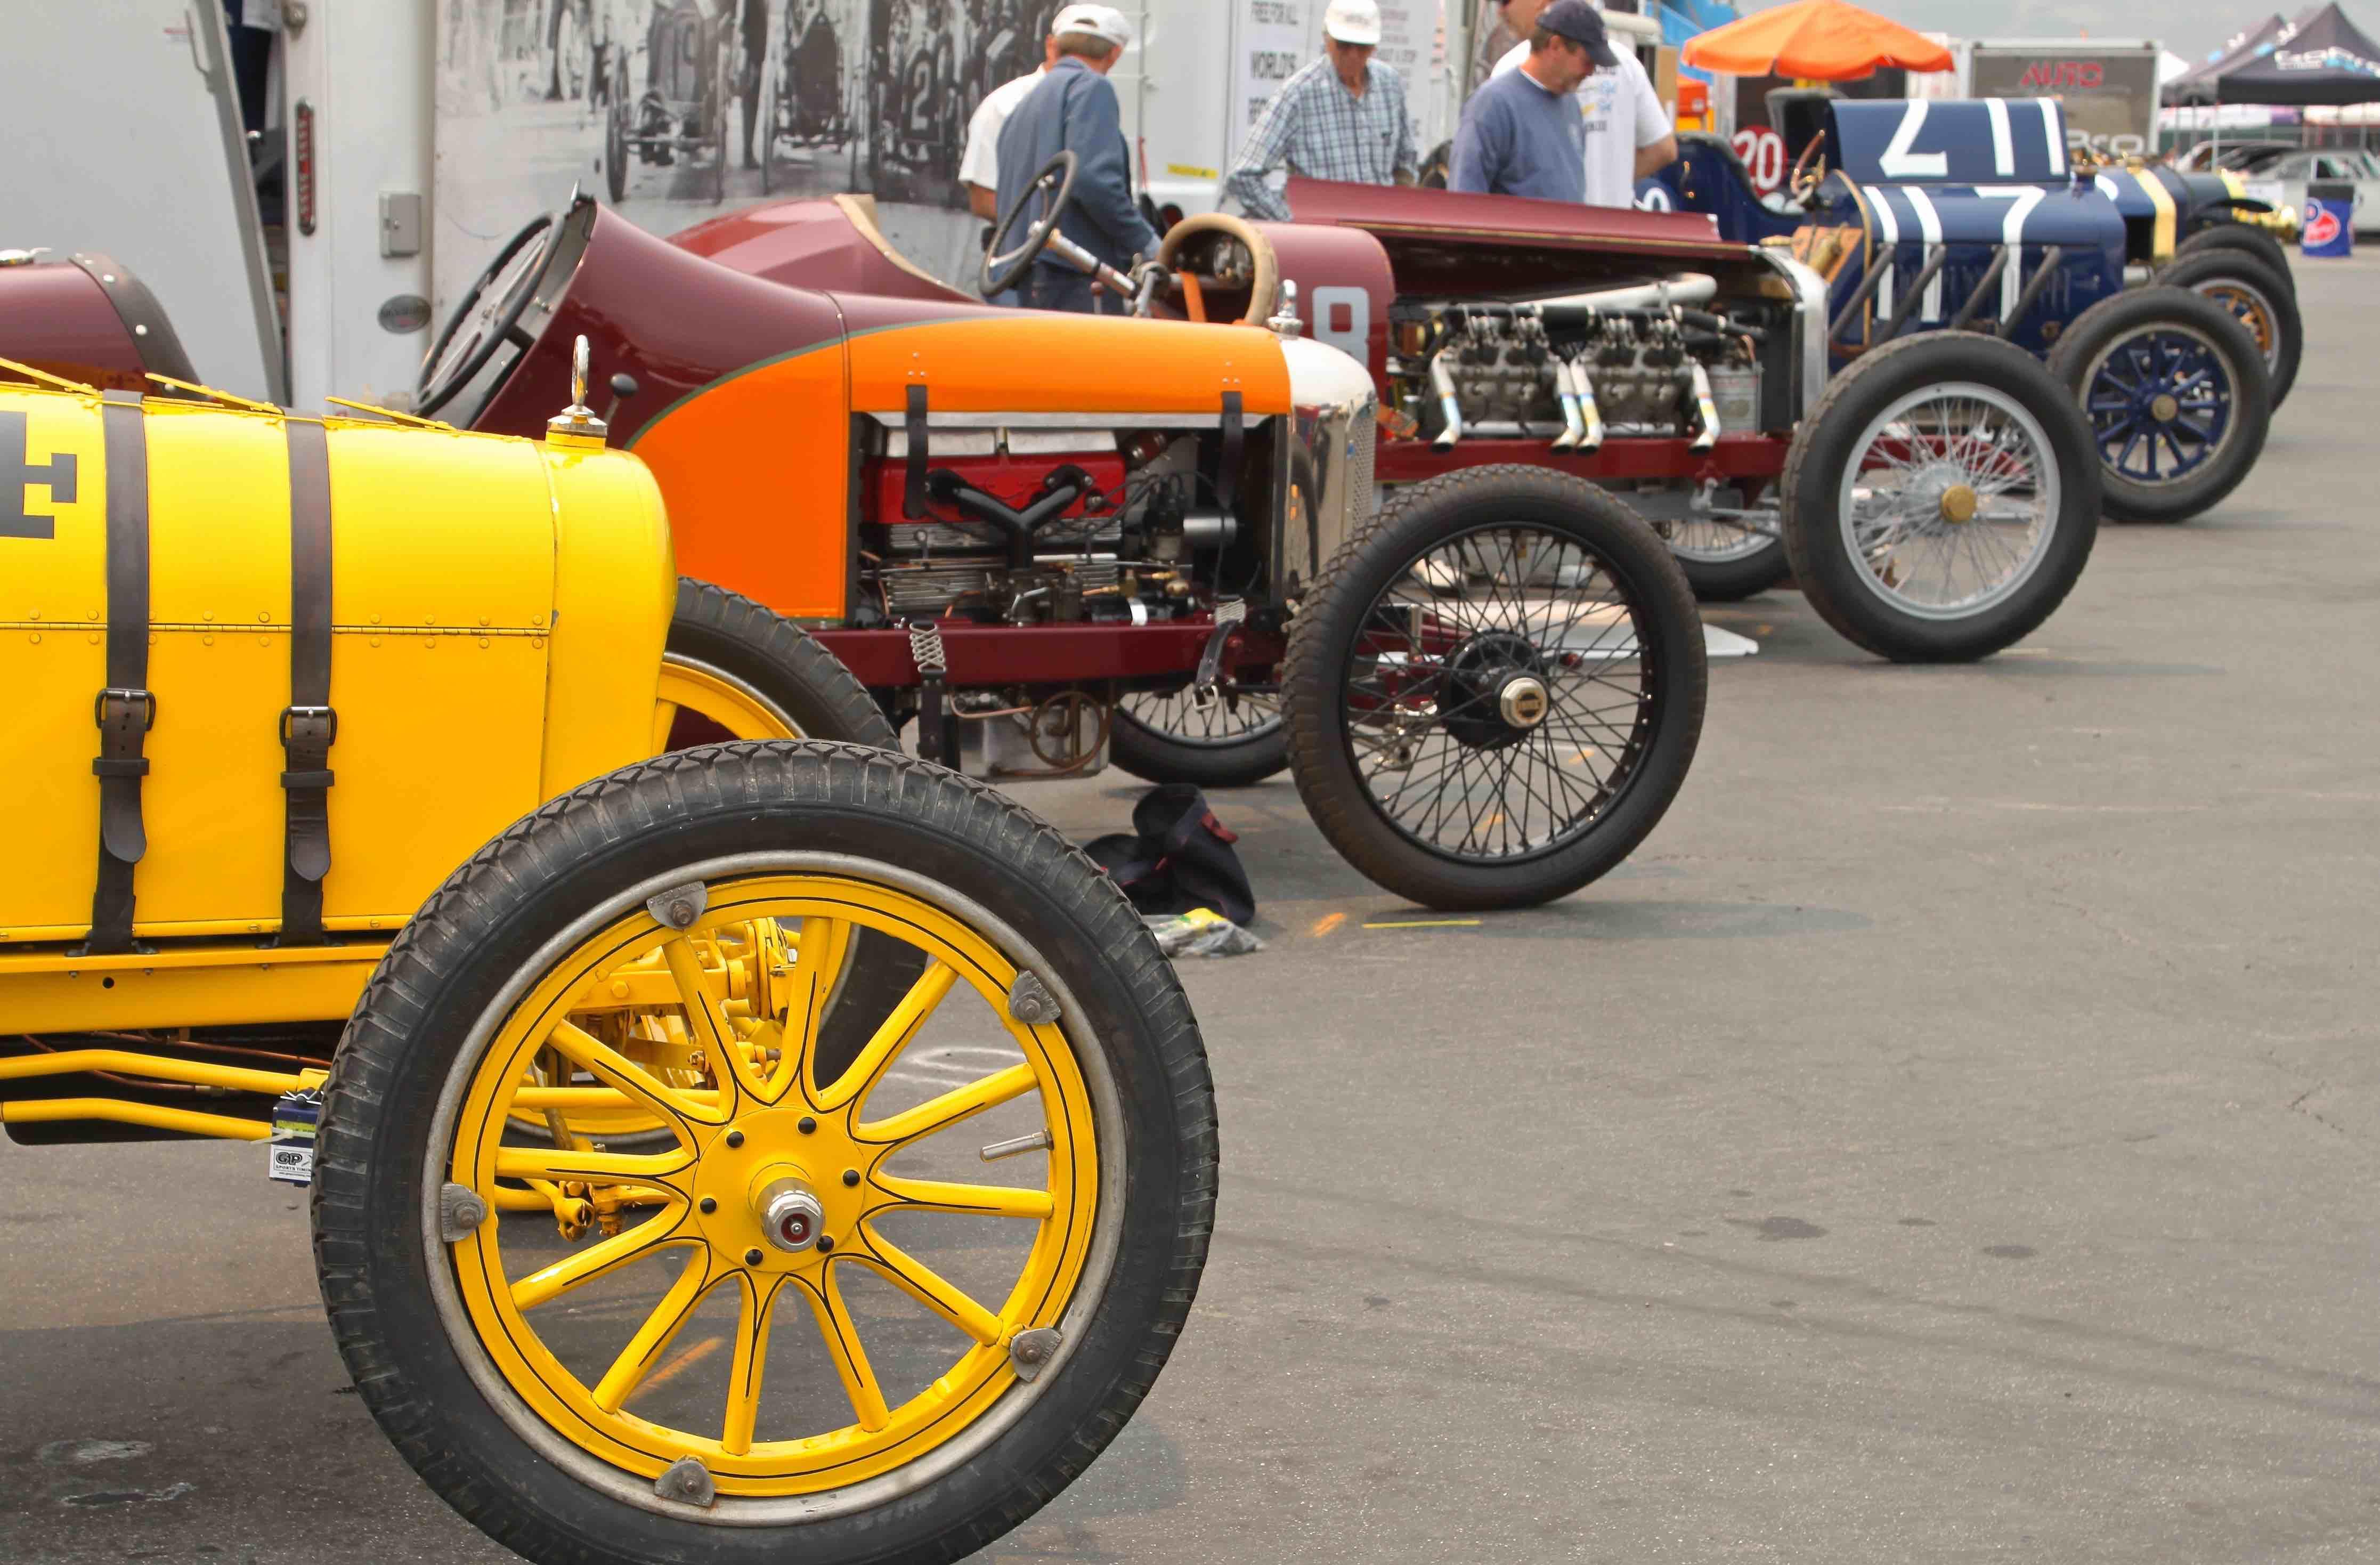 Monterey 2016 Day 5 - Laguna prewar classic race cars